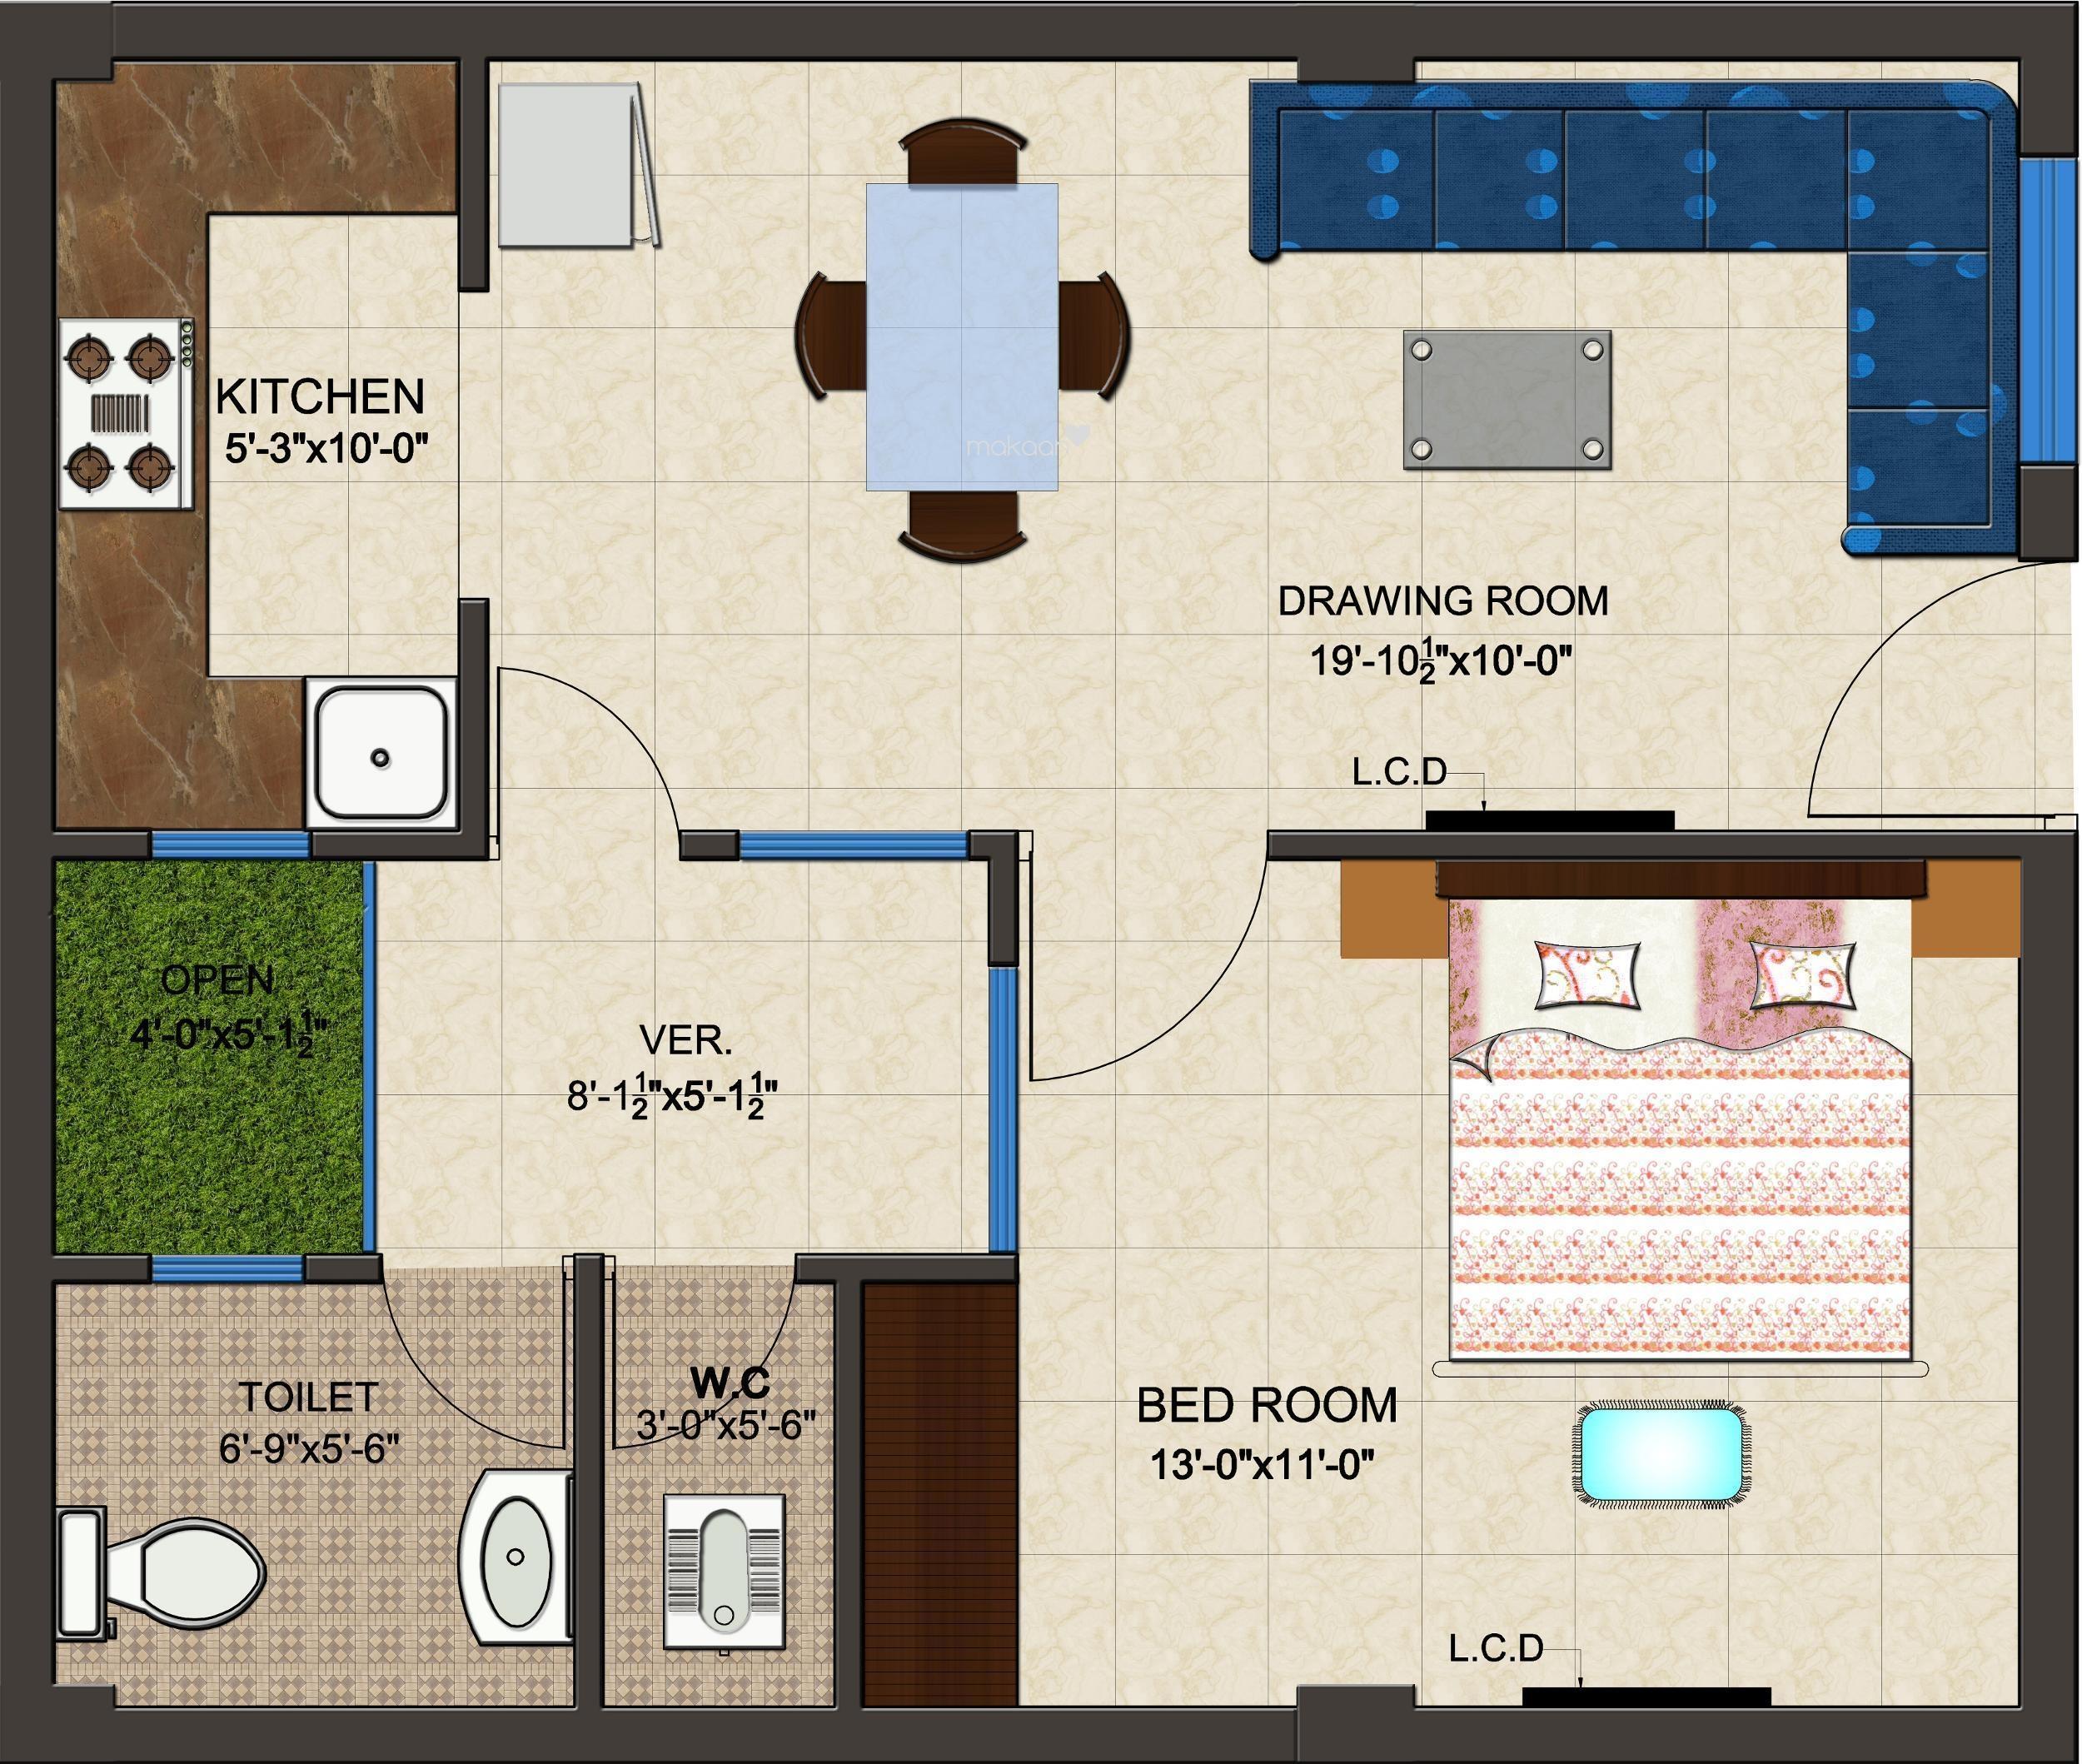 Rts Group Katyani Apartments 1bhk1t 800 Sq Ft Apartment 800 Sq